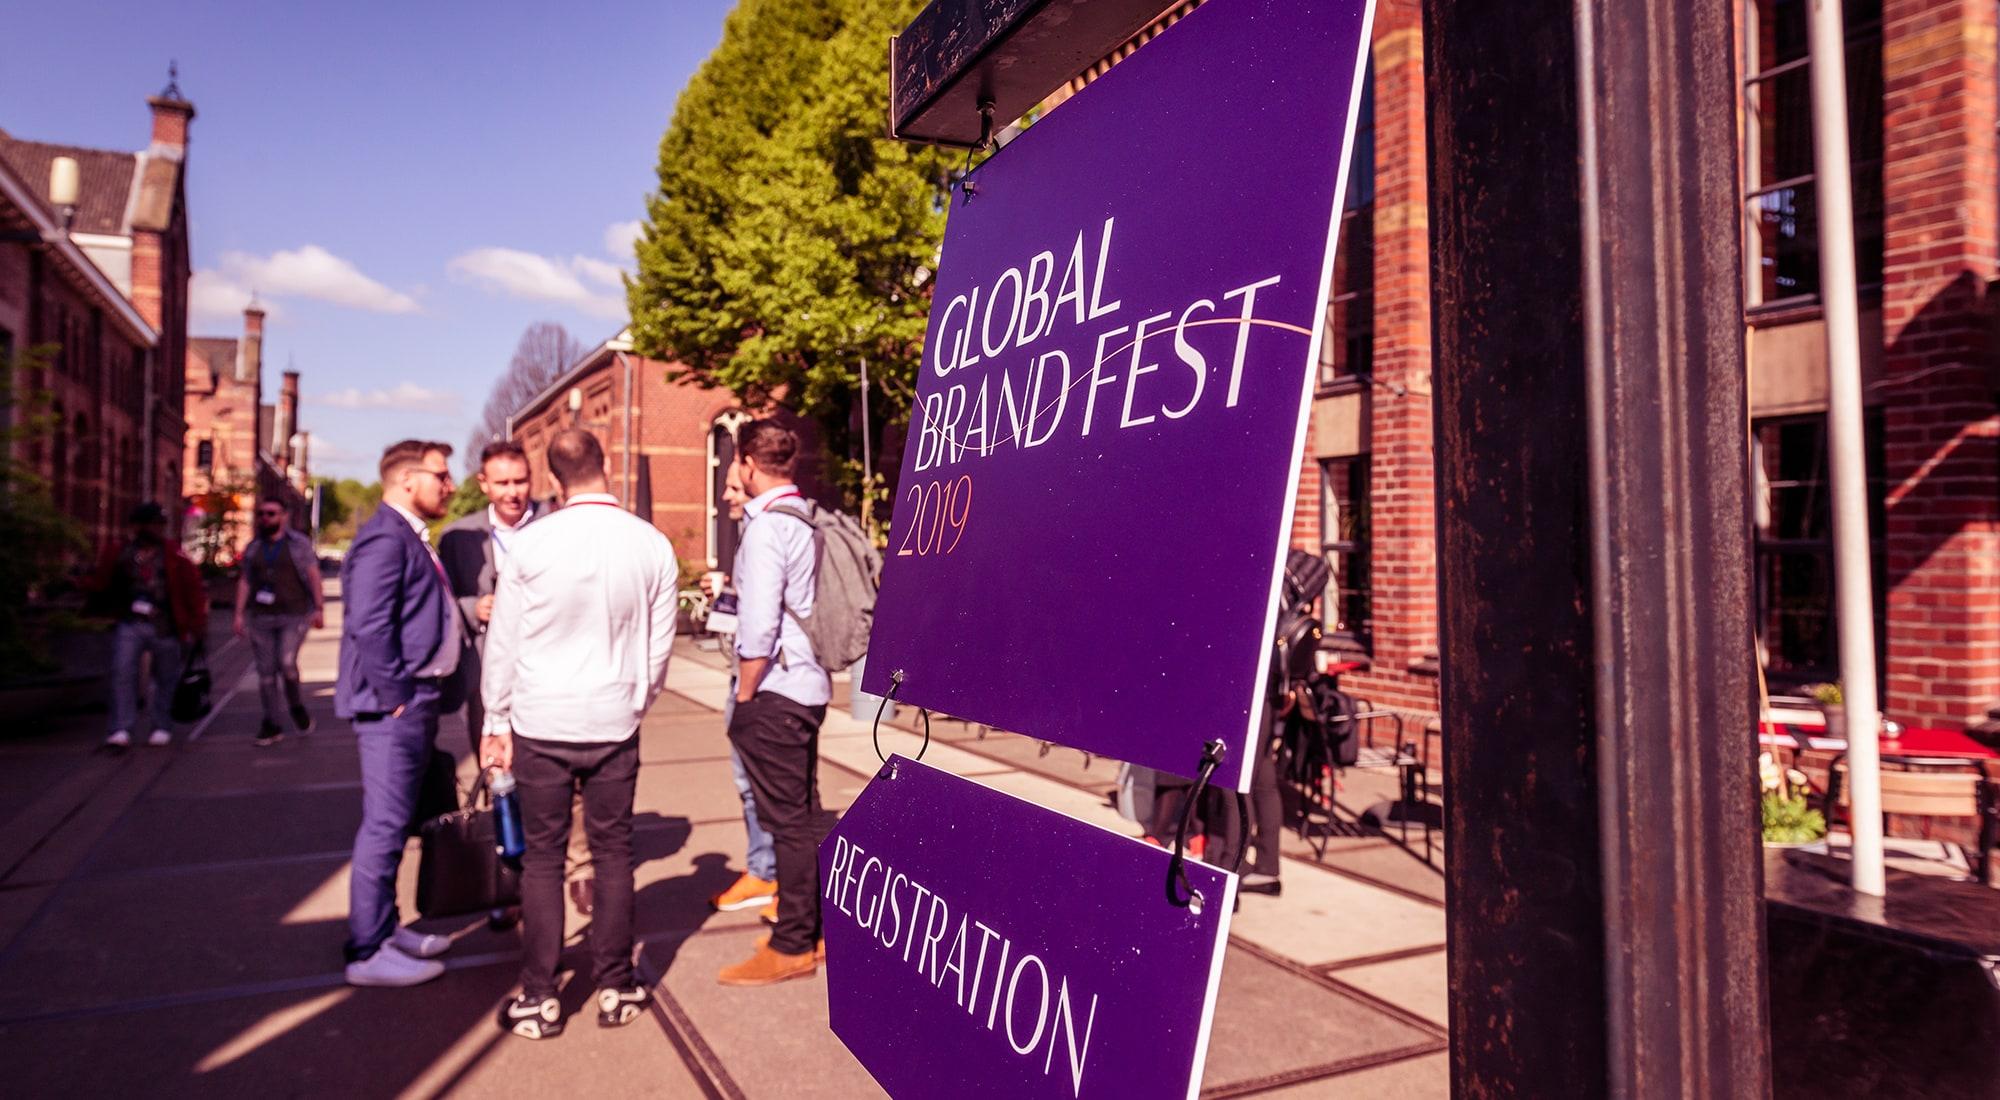 Brand Fest